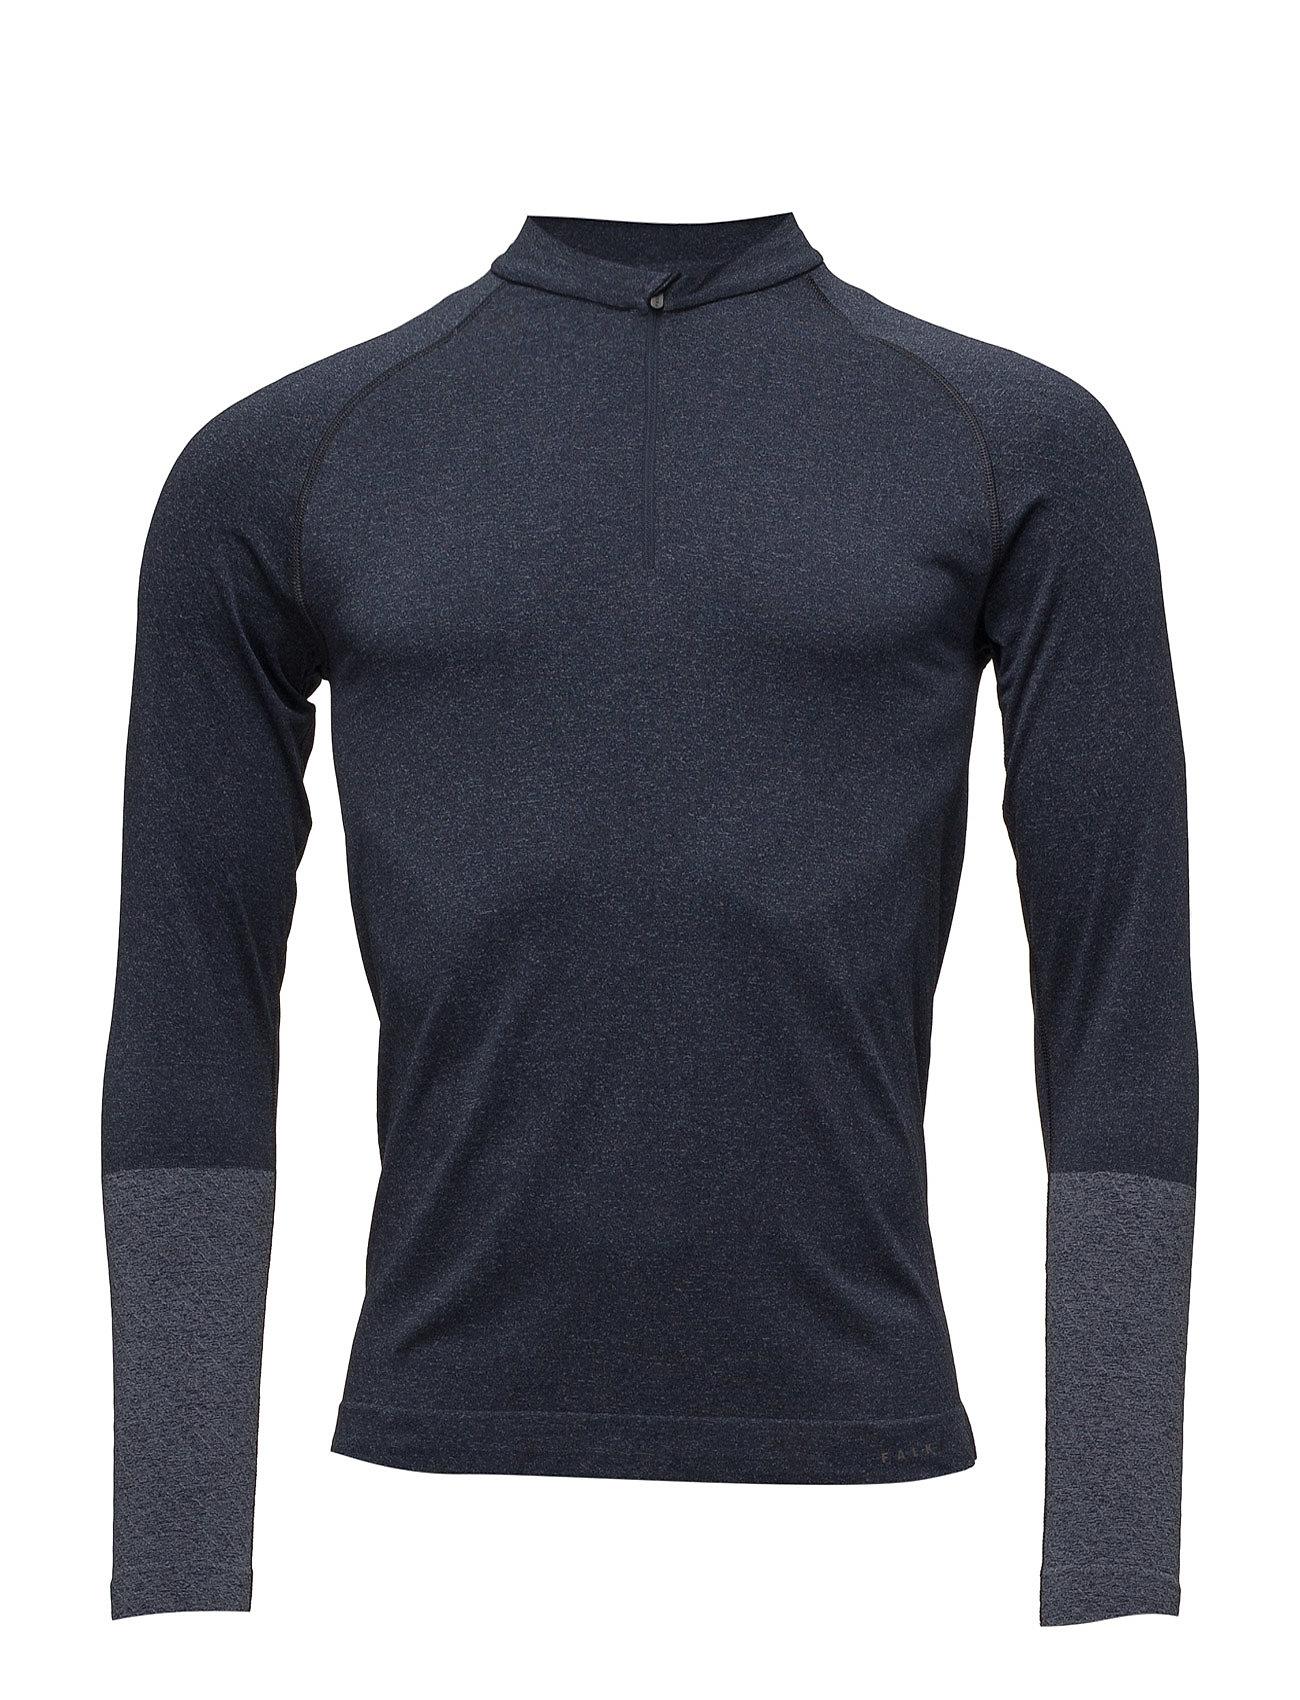 falke sport – Zip shirt ls m på boozt.com dk